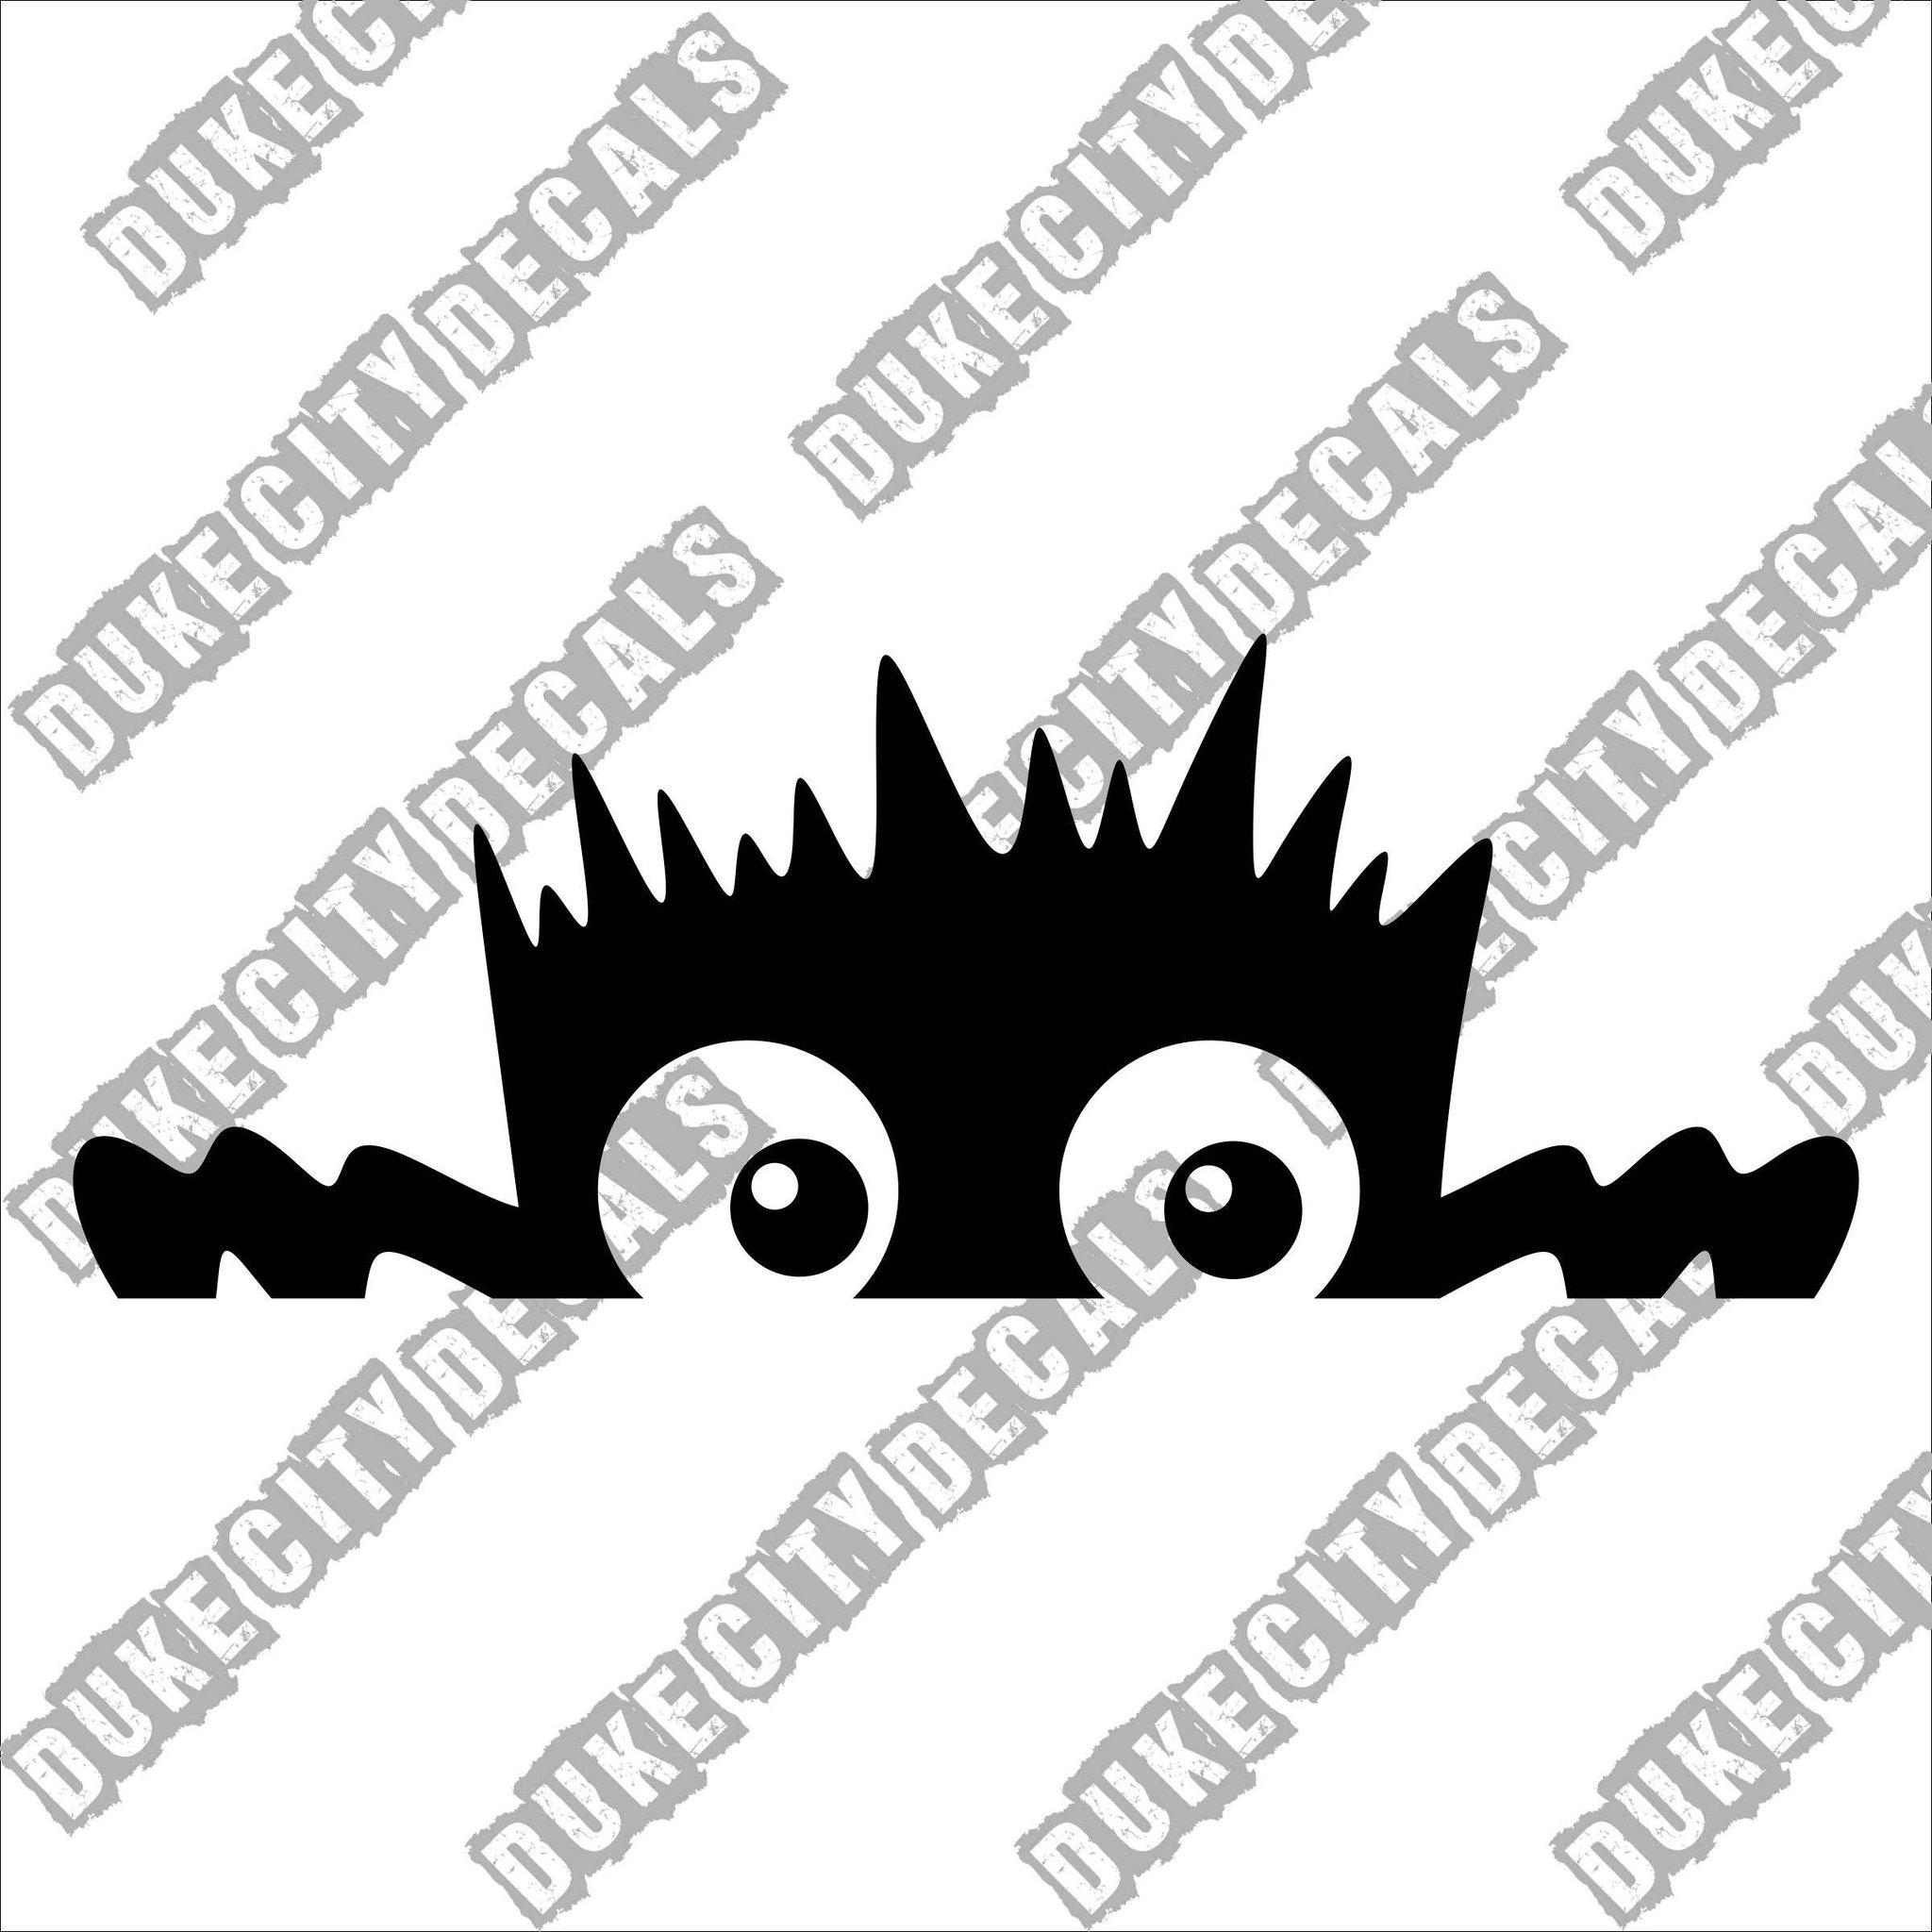 Ducati 696 perfili adesivi//adhesives//stickers//decal